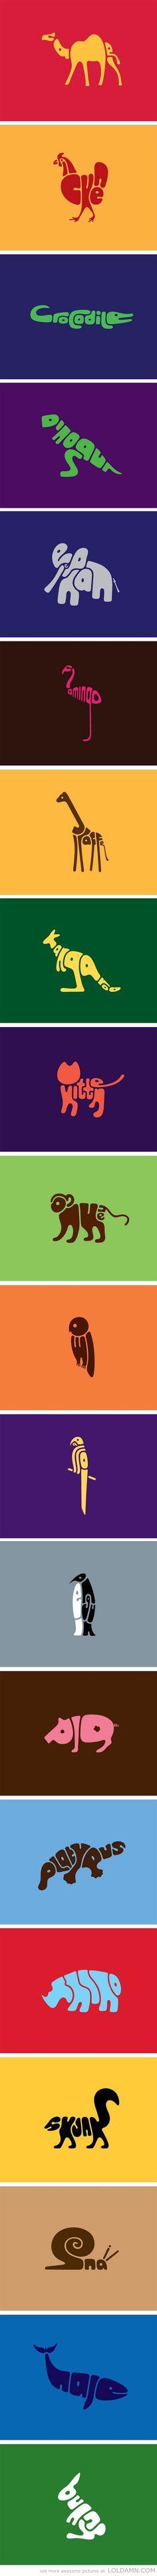 Word animals.